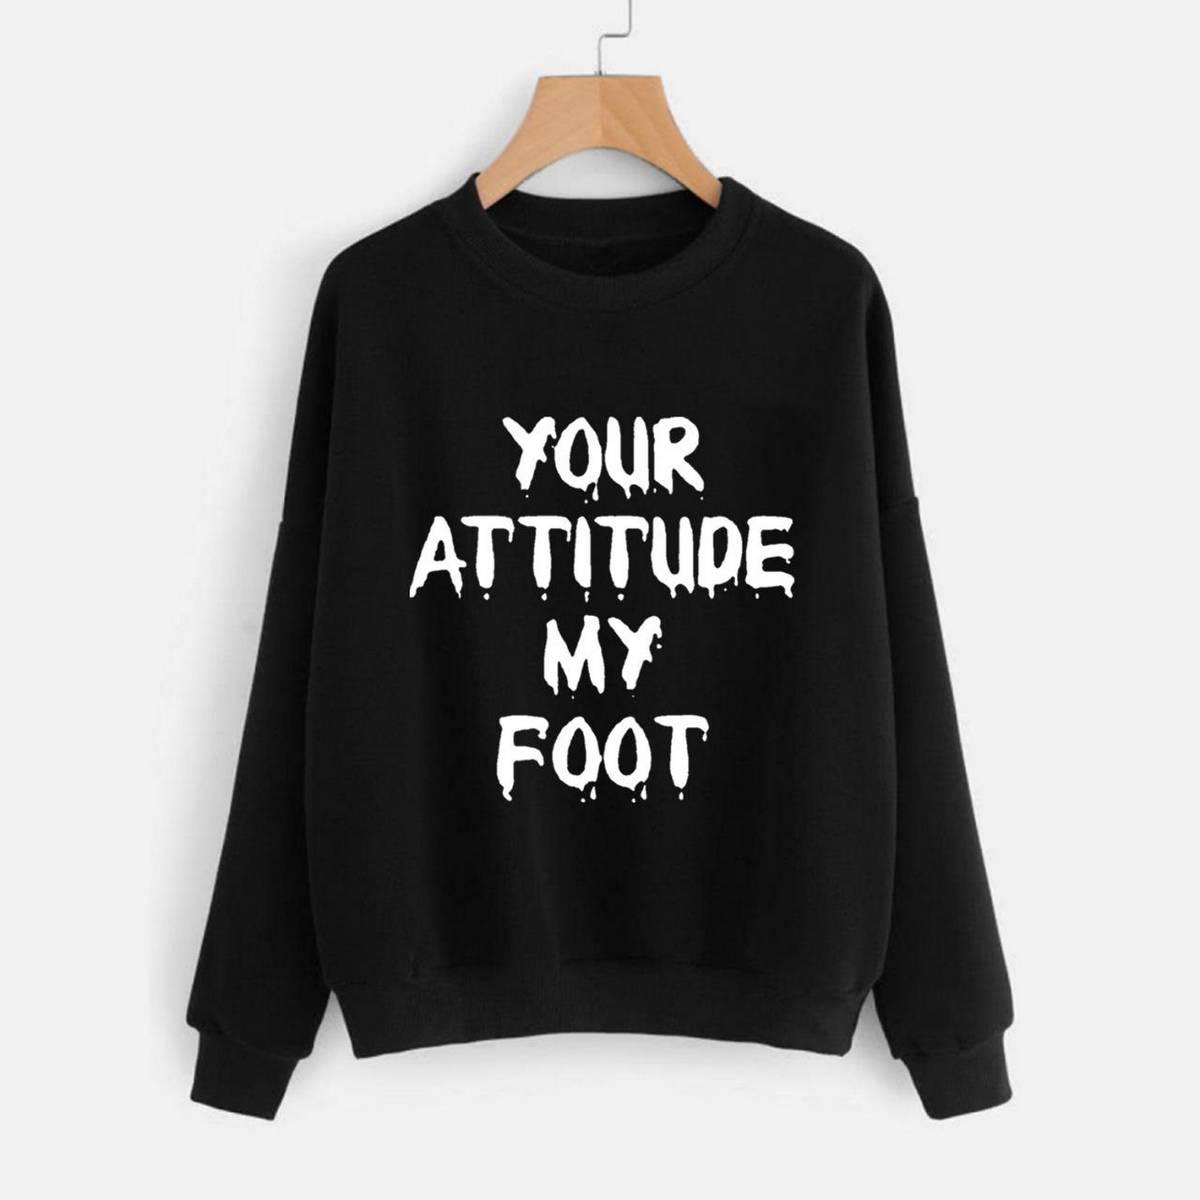 Sweat shirt For Girls (U.A.M.F) Winter Wear Export Quality Sweatshirt Round Neck Full Sleeves Sweat Shirts